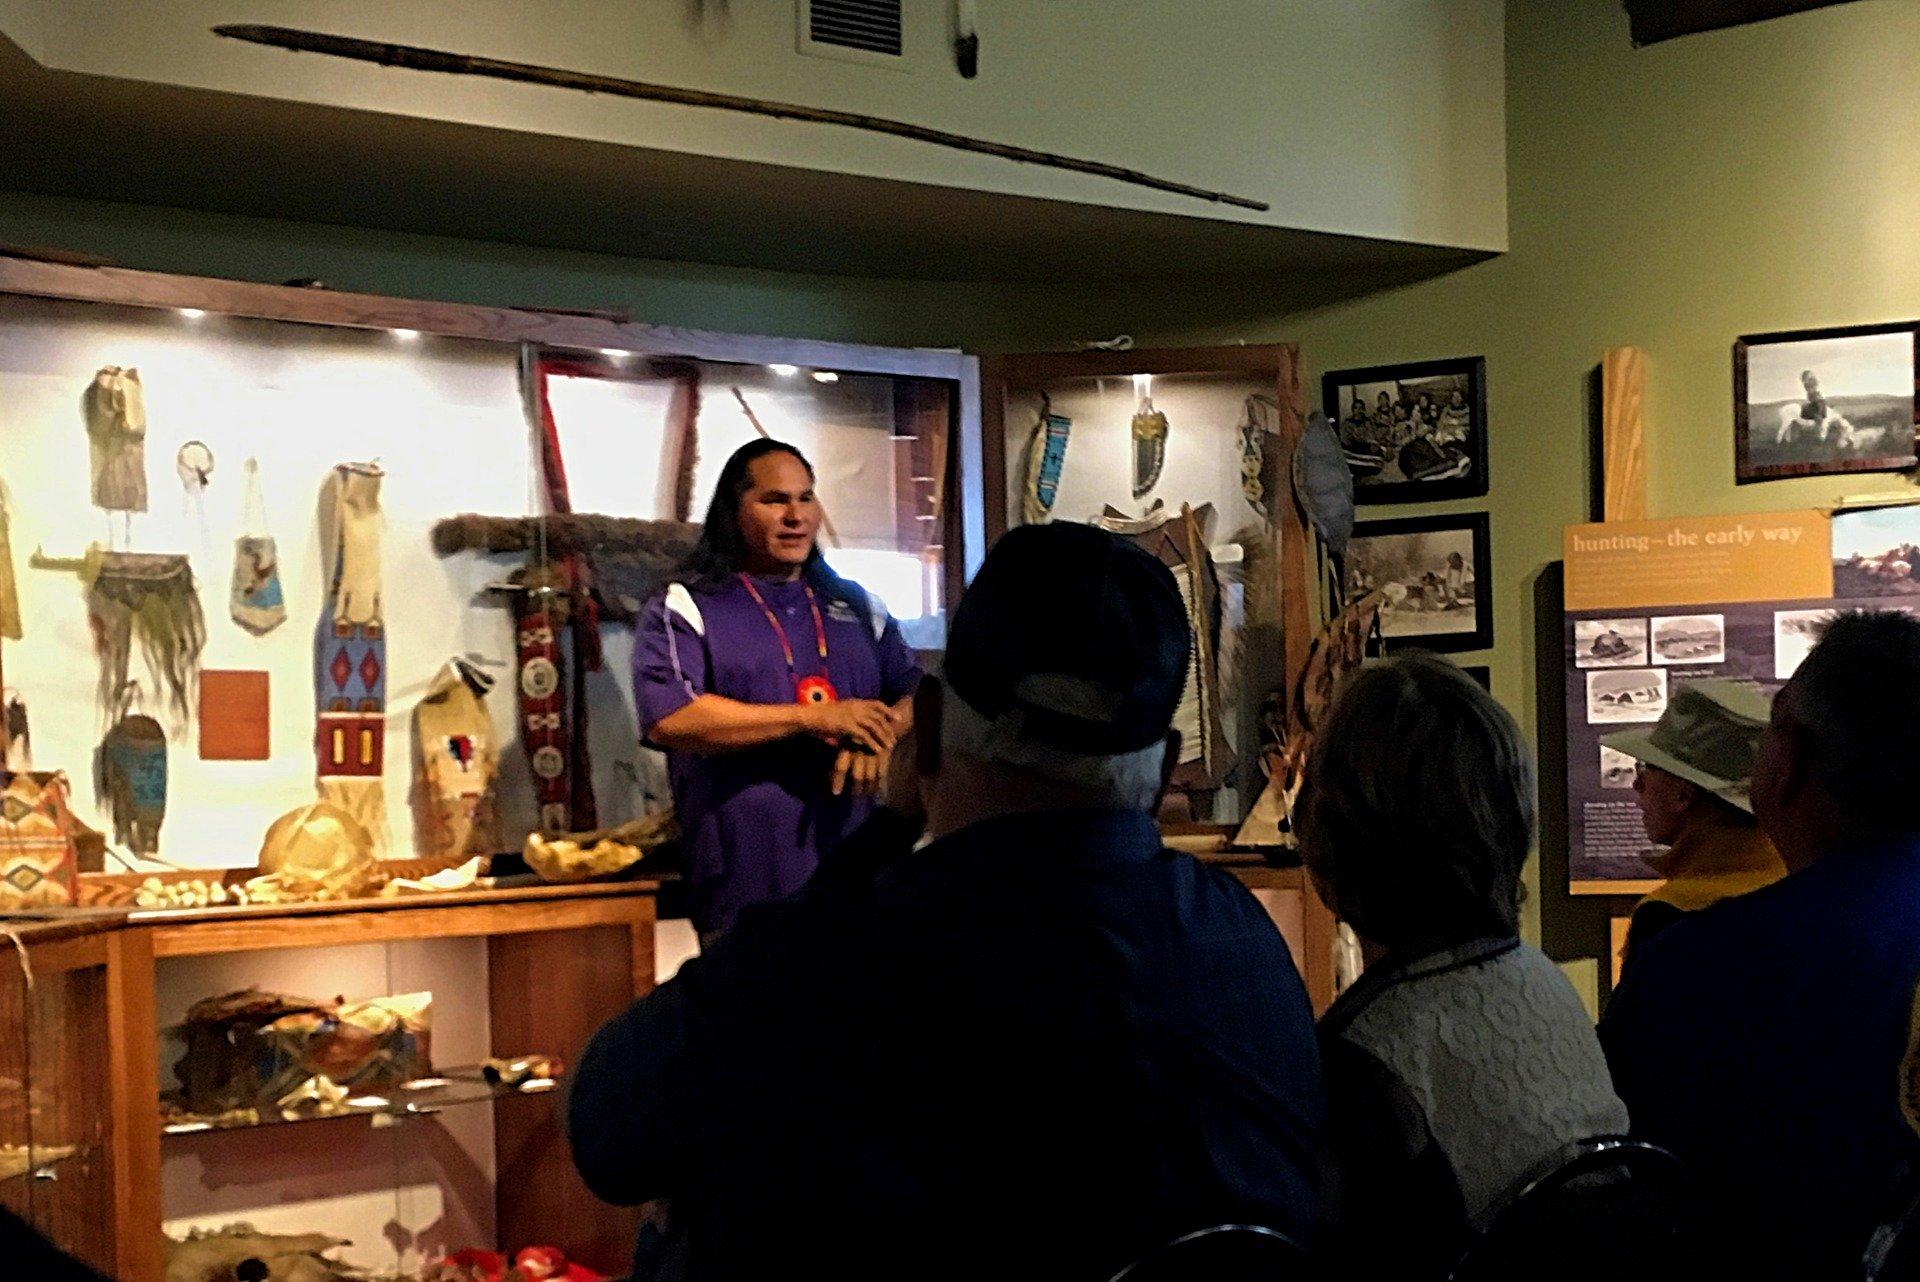 Lakota Sioux man in Deadwood